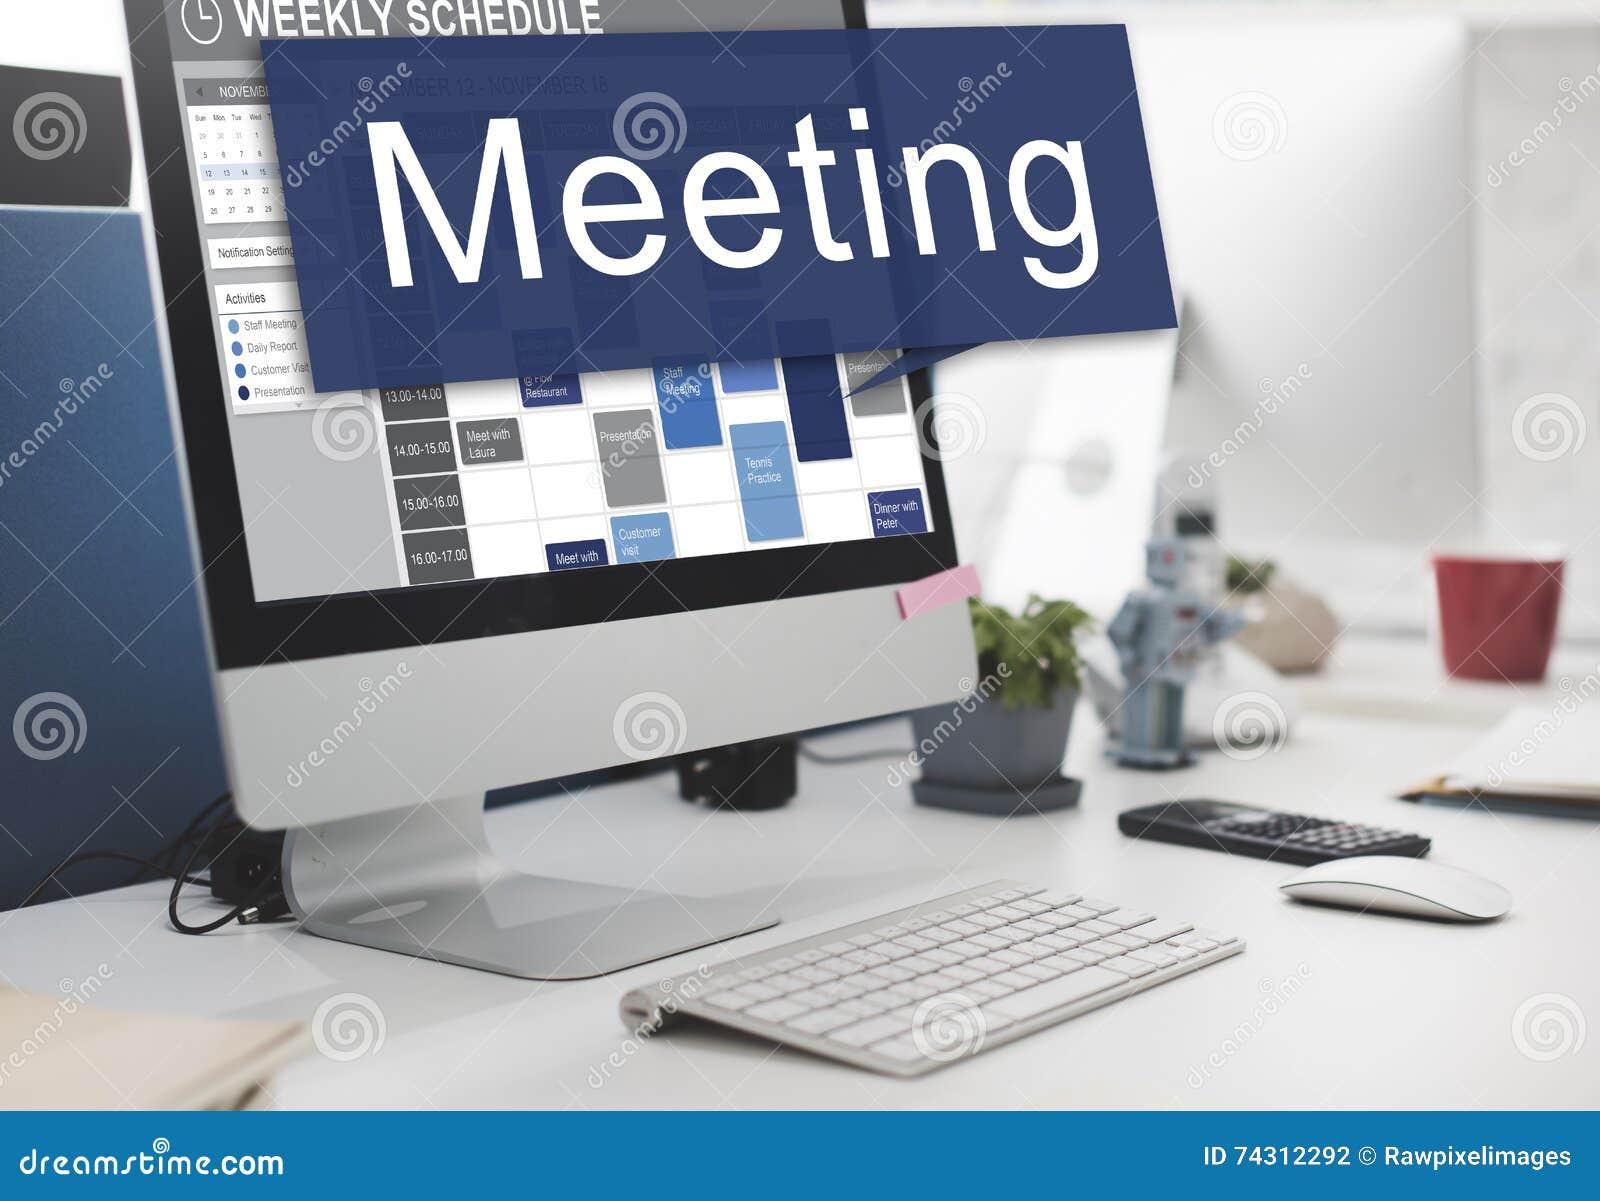 Концепция конференции организатора план-графика назначения встречи